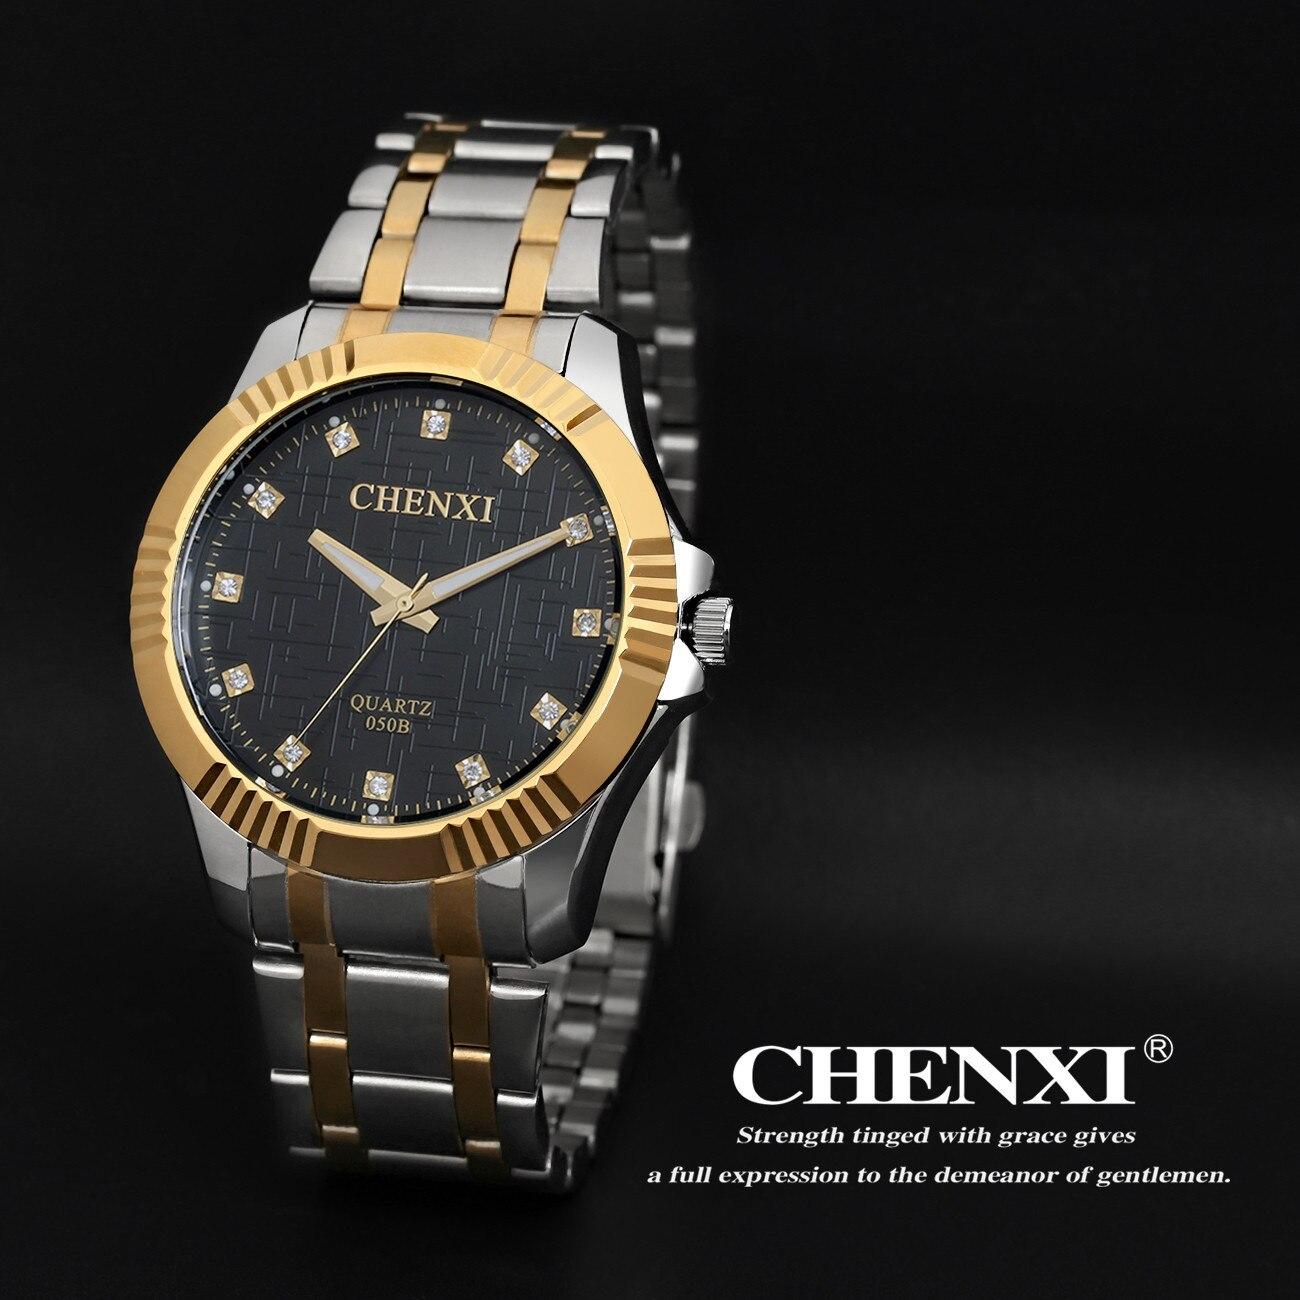 Luxury New Brand Crystal Bling Rhinestone Stainless Steel Analog Quartz Dress Wristwatches Wrist Watch for Men Male цена 2016